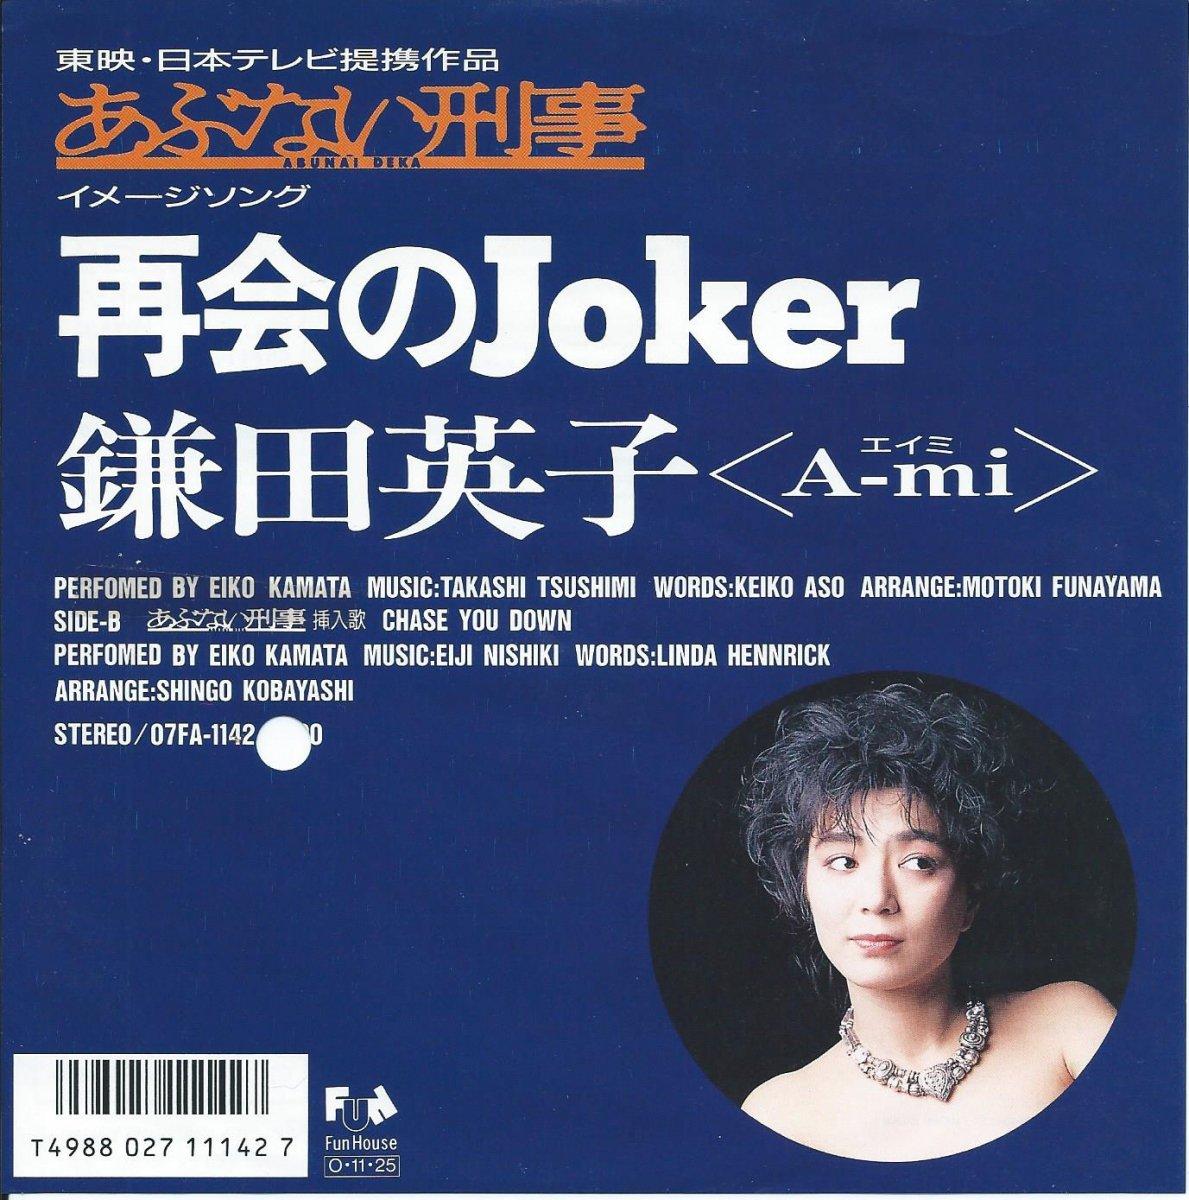 鎌田英子 EIKO KAMATA